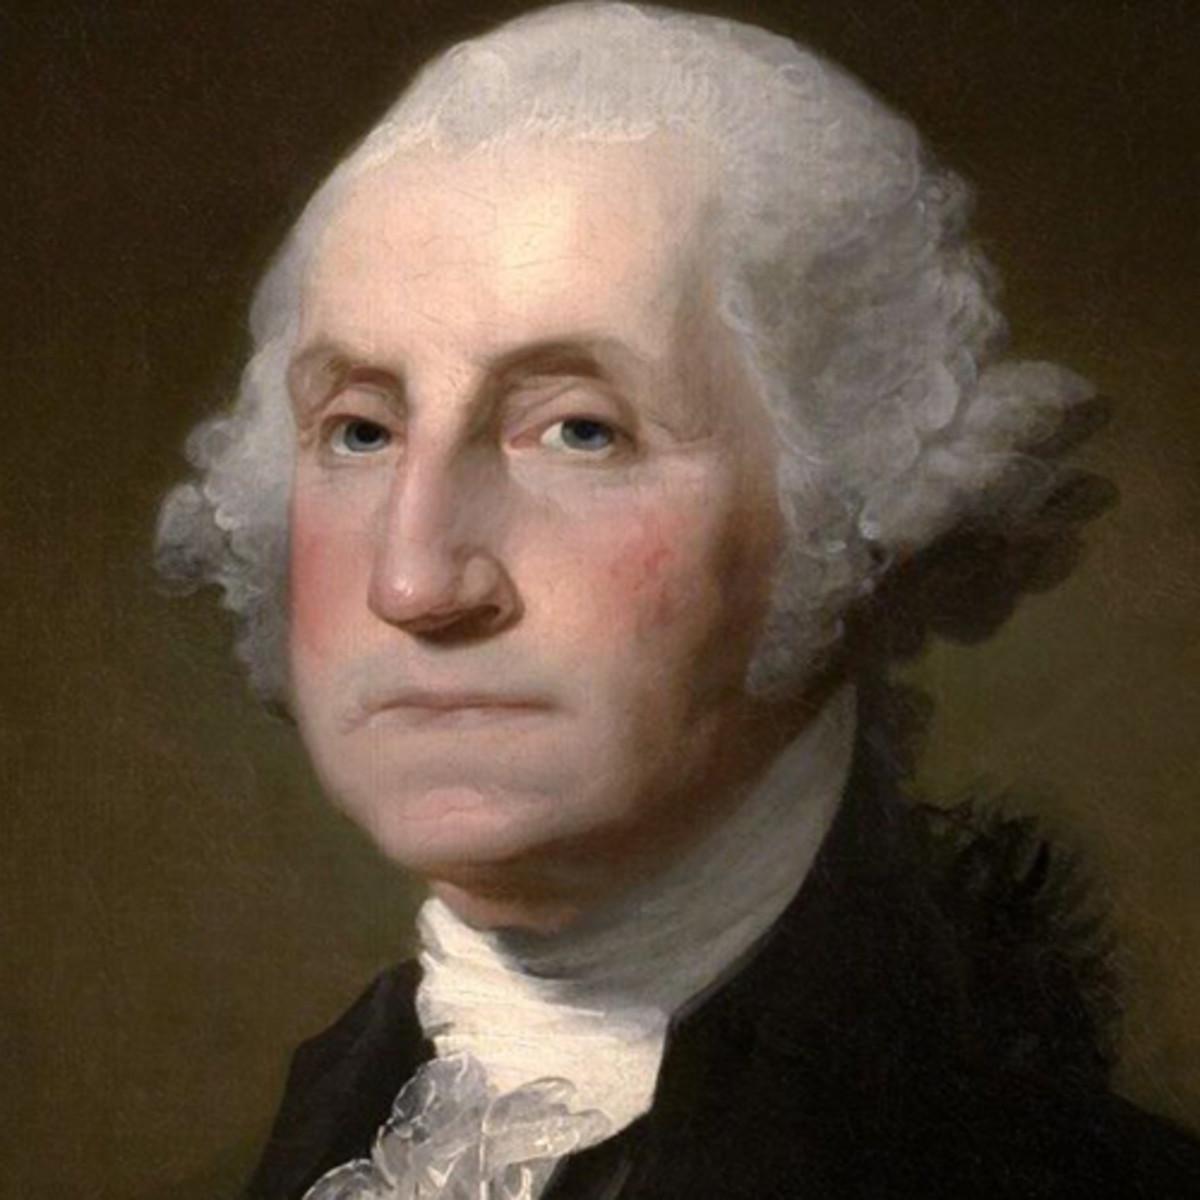 جورج واشنطن: سيرة شخصية